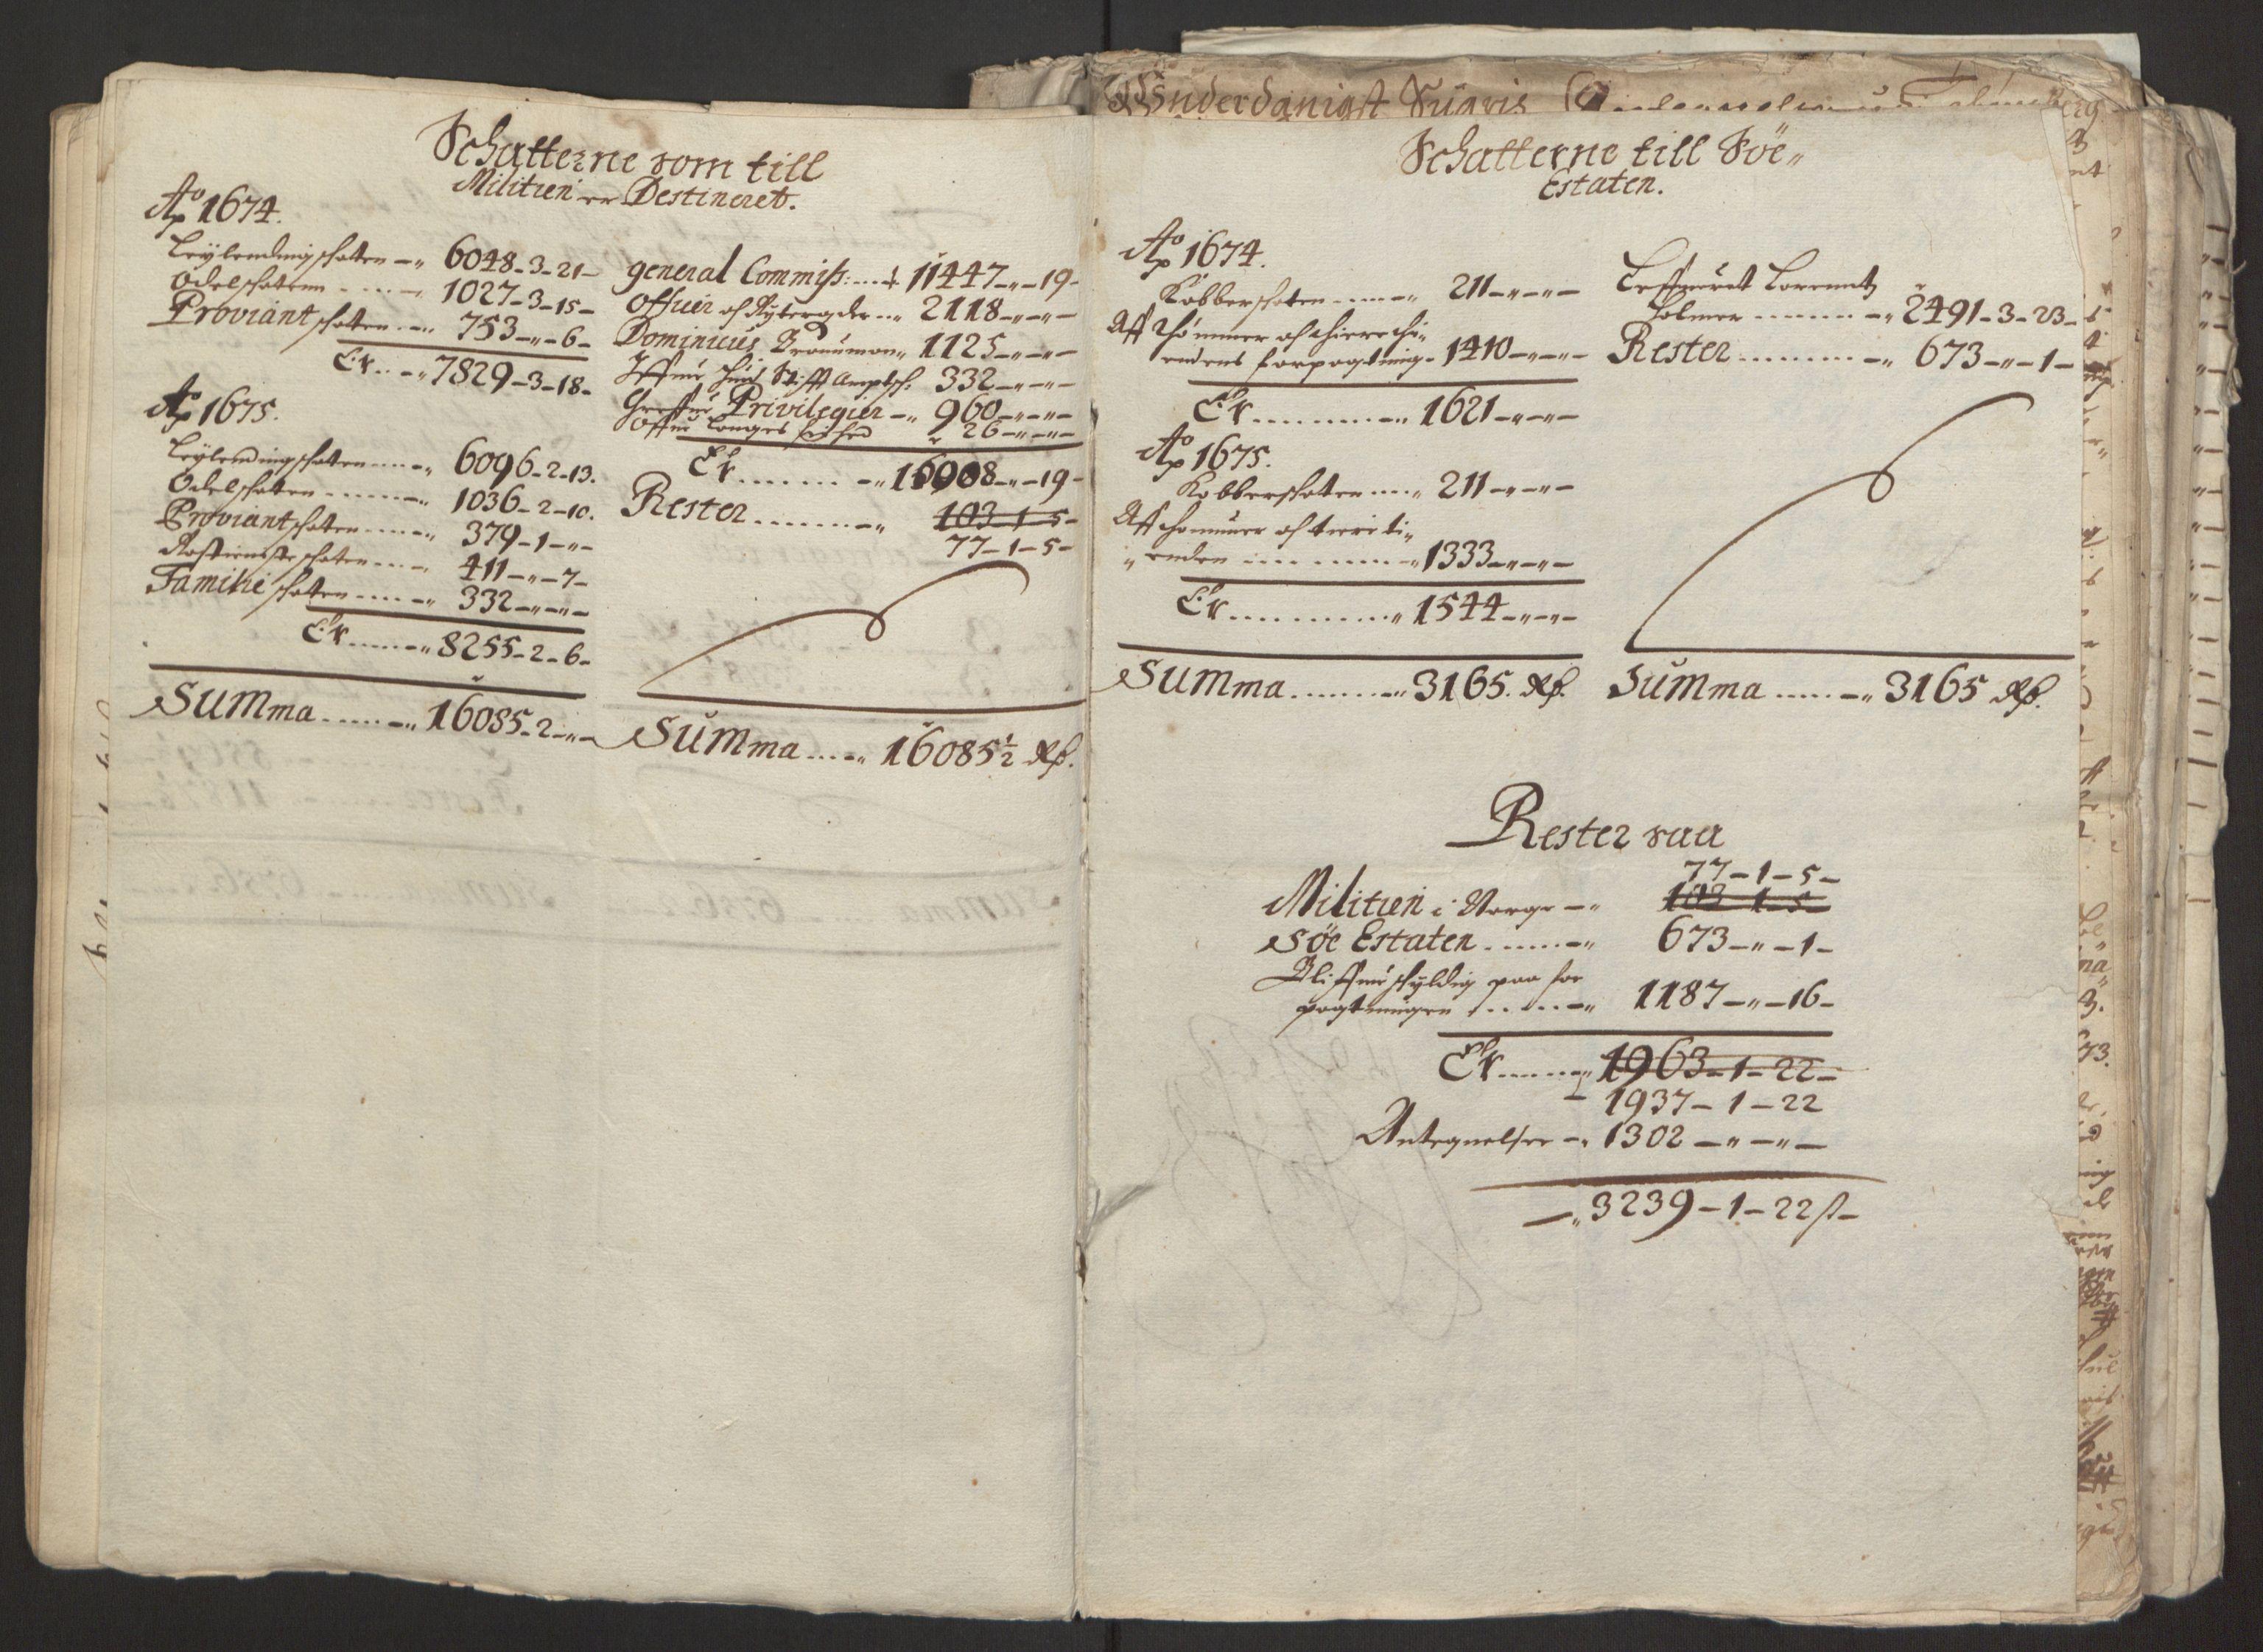 RA, Rentekammeret inntil 1814, Reviderte regnskaper, Fogderegnskap, R32/L1843: Fogderegnskap Jarlsberg grevskap, 1674-1675, s. 26